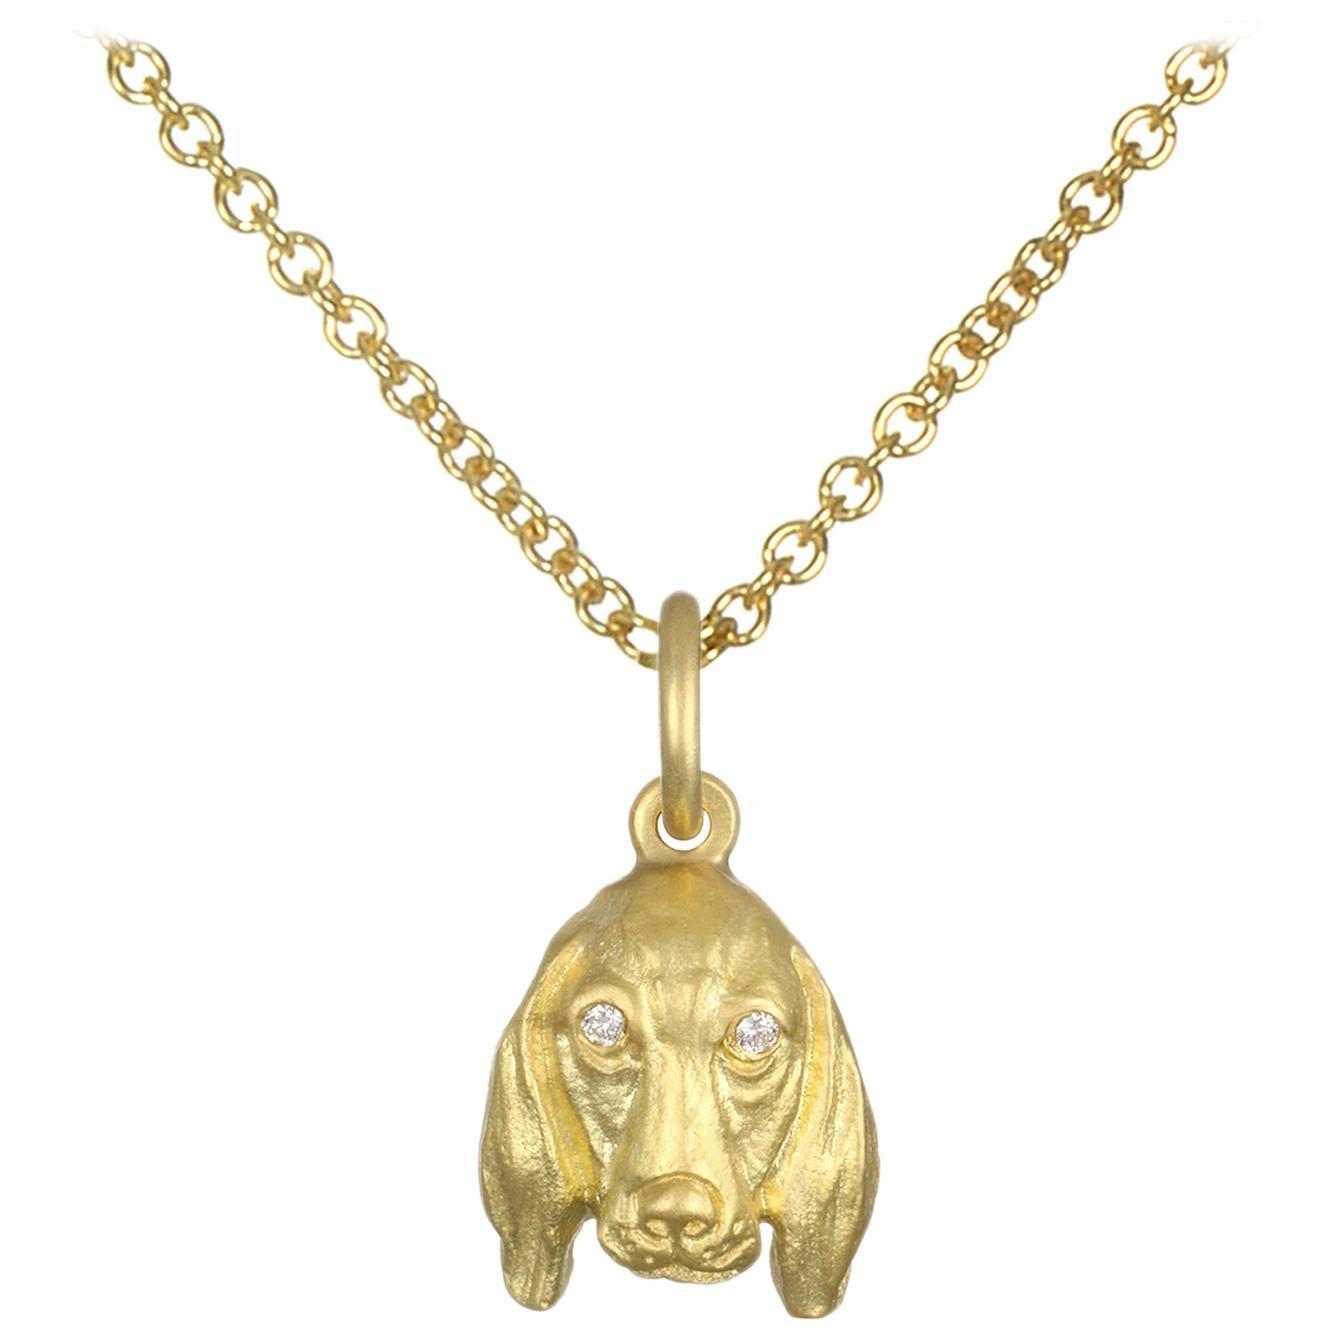 Faye Kim 18 Karat Gold Basset Hound Dog Charm Necklace with Diamond Eyes